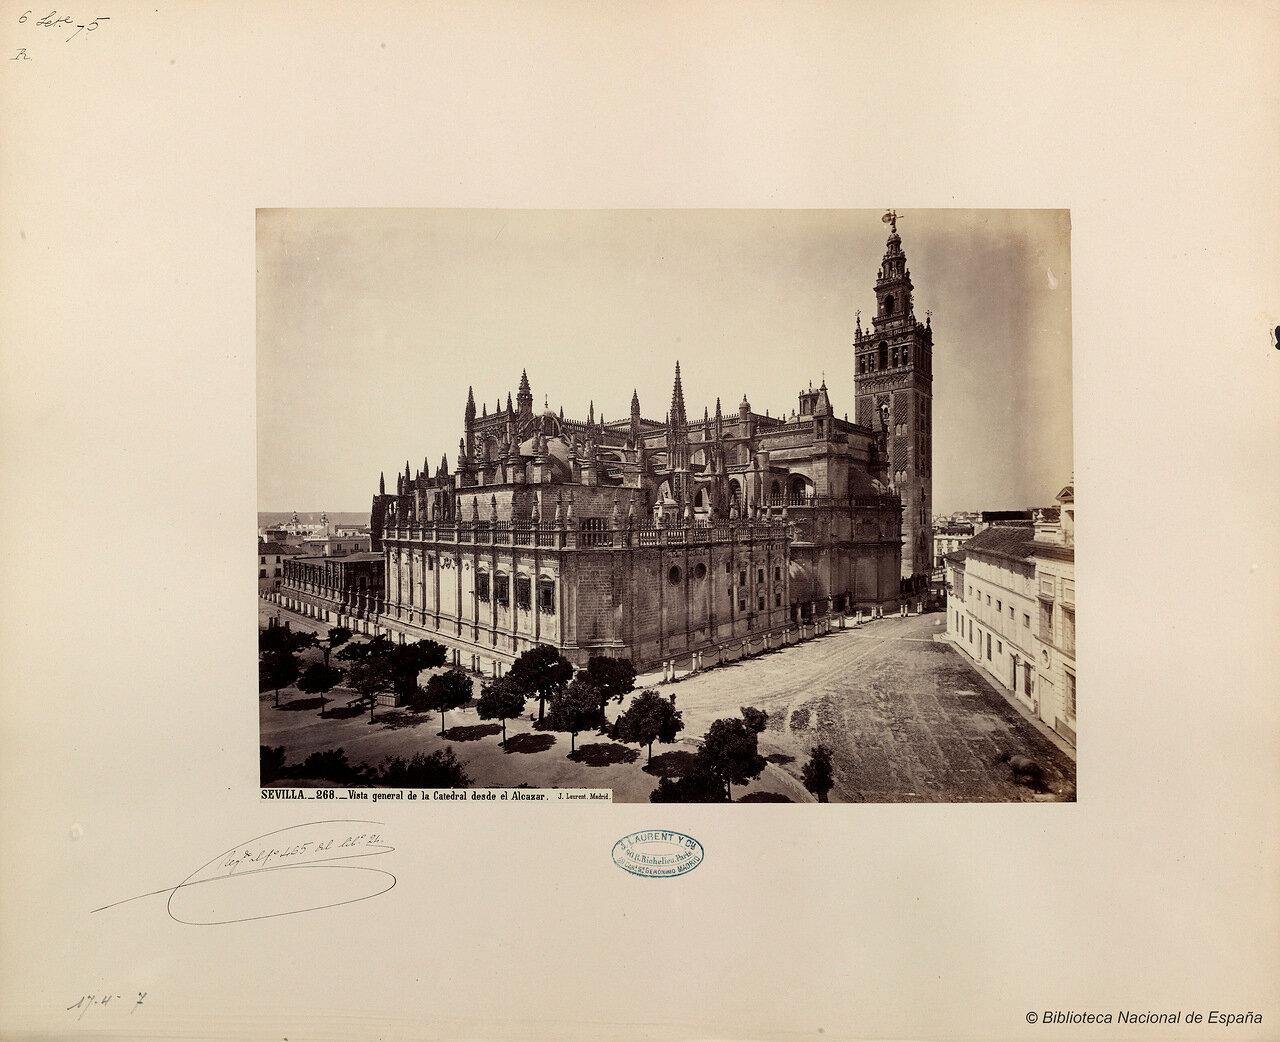 Вид дворца Алькасар в Севильи